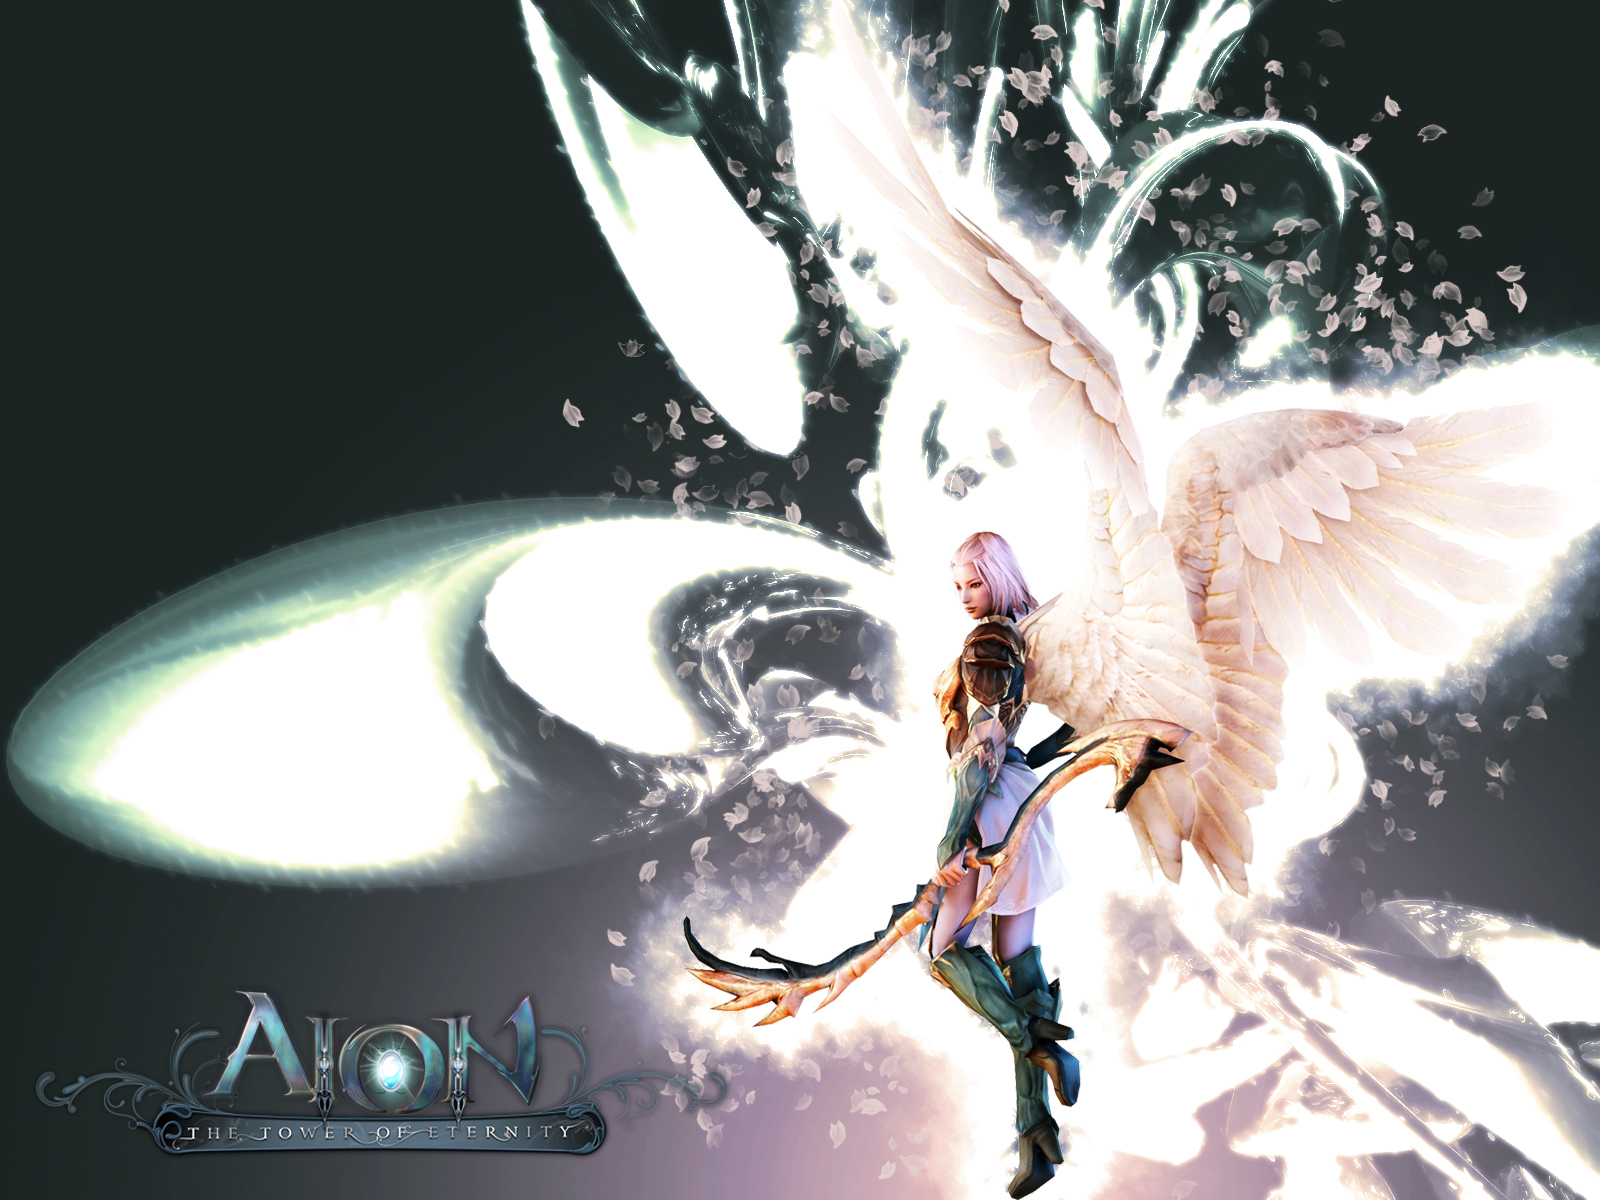 http://fc05.deviantart.net/fs39/f/2008/321/7/9/Aion___Elyos_Wallpaper_II_by_sHao_taisa.jpg